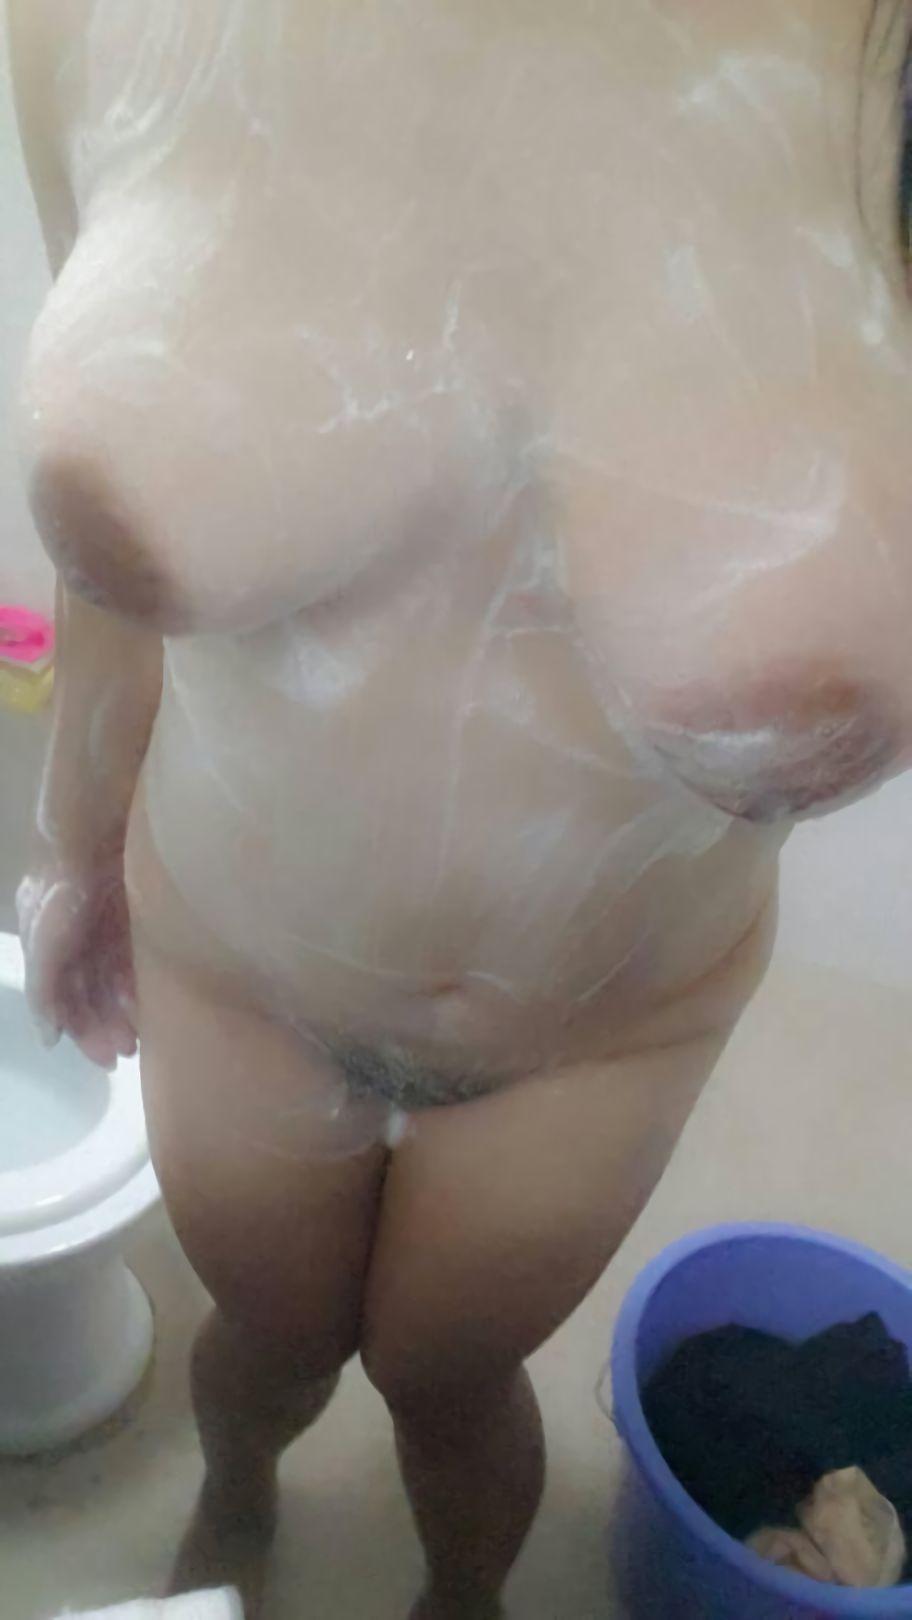 foto bugi cewek toket gede montok lagi mandi. Gambar bokep wanita payudara gede memek jembut lebat mandi sambil narsis,cewek telanjang, memek basah